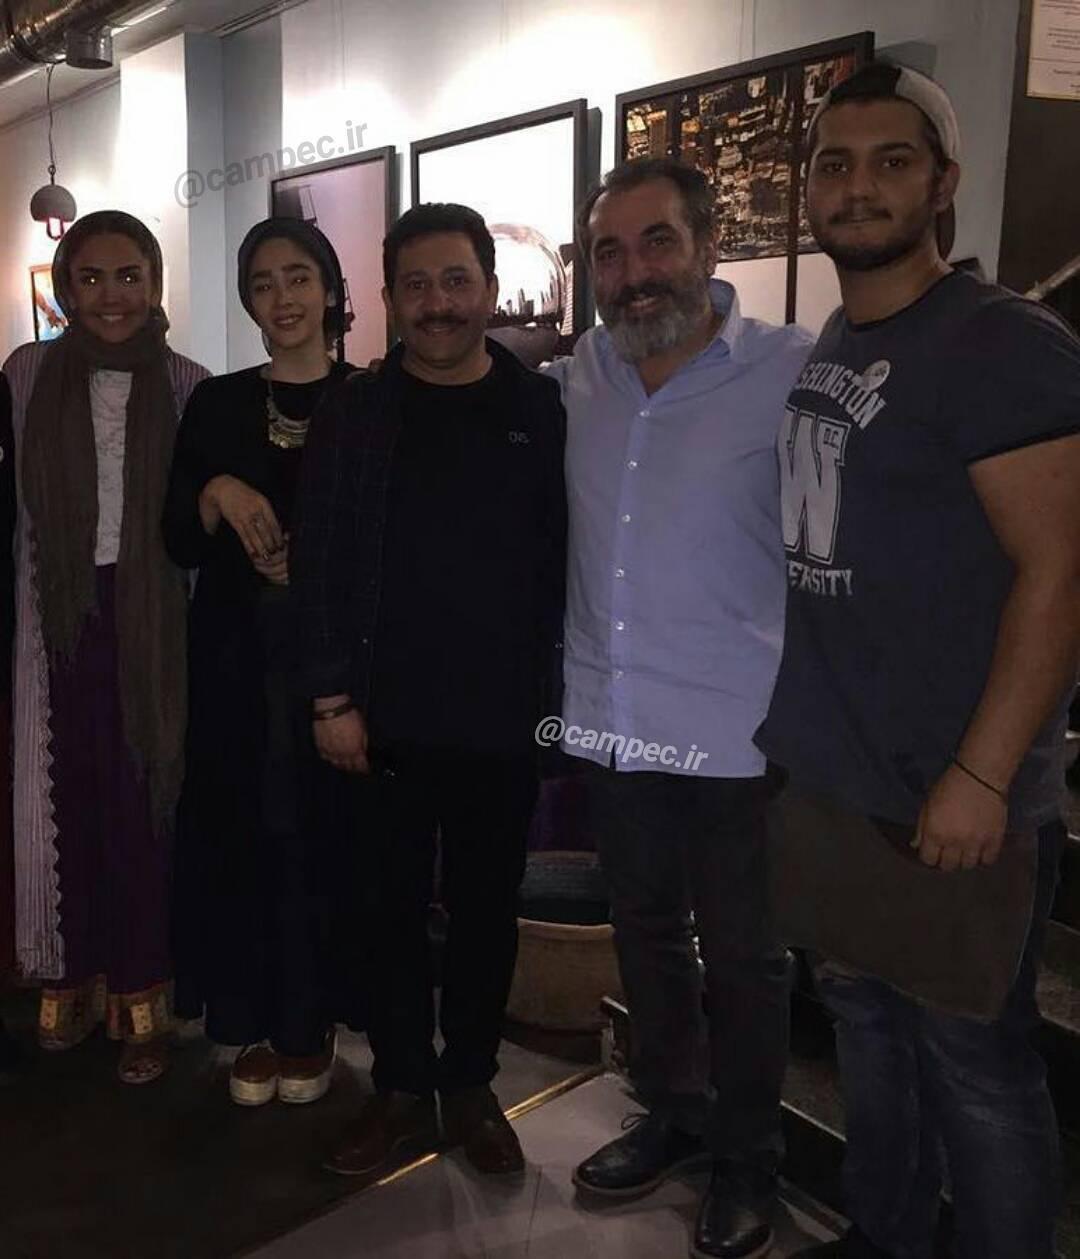 عکس جدید سیامک انصاری با همسرش و سروش جمشیدی